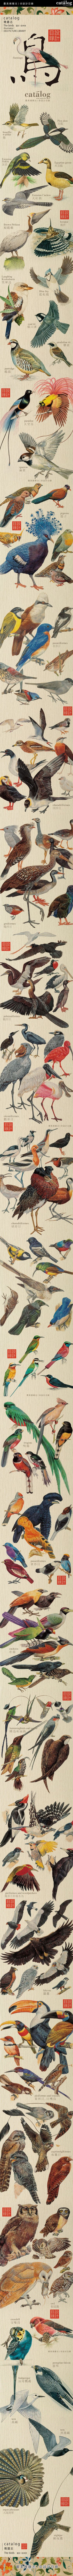 birds catalog